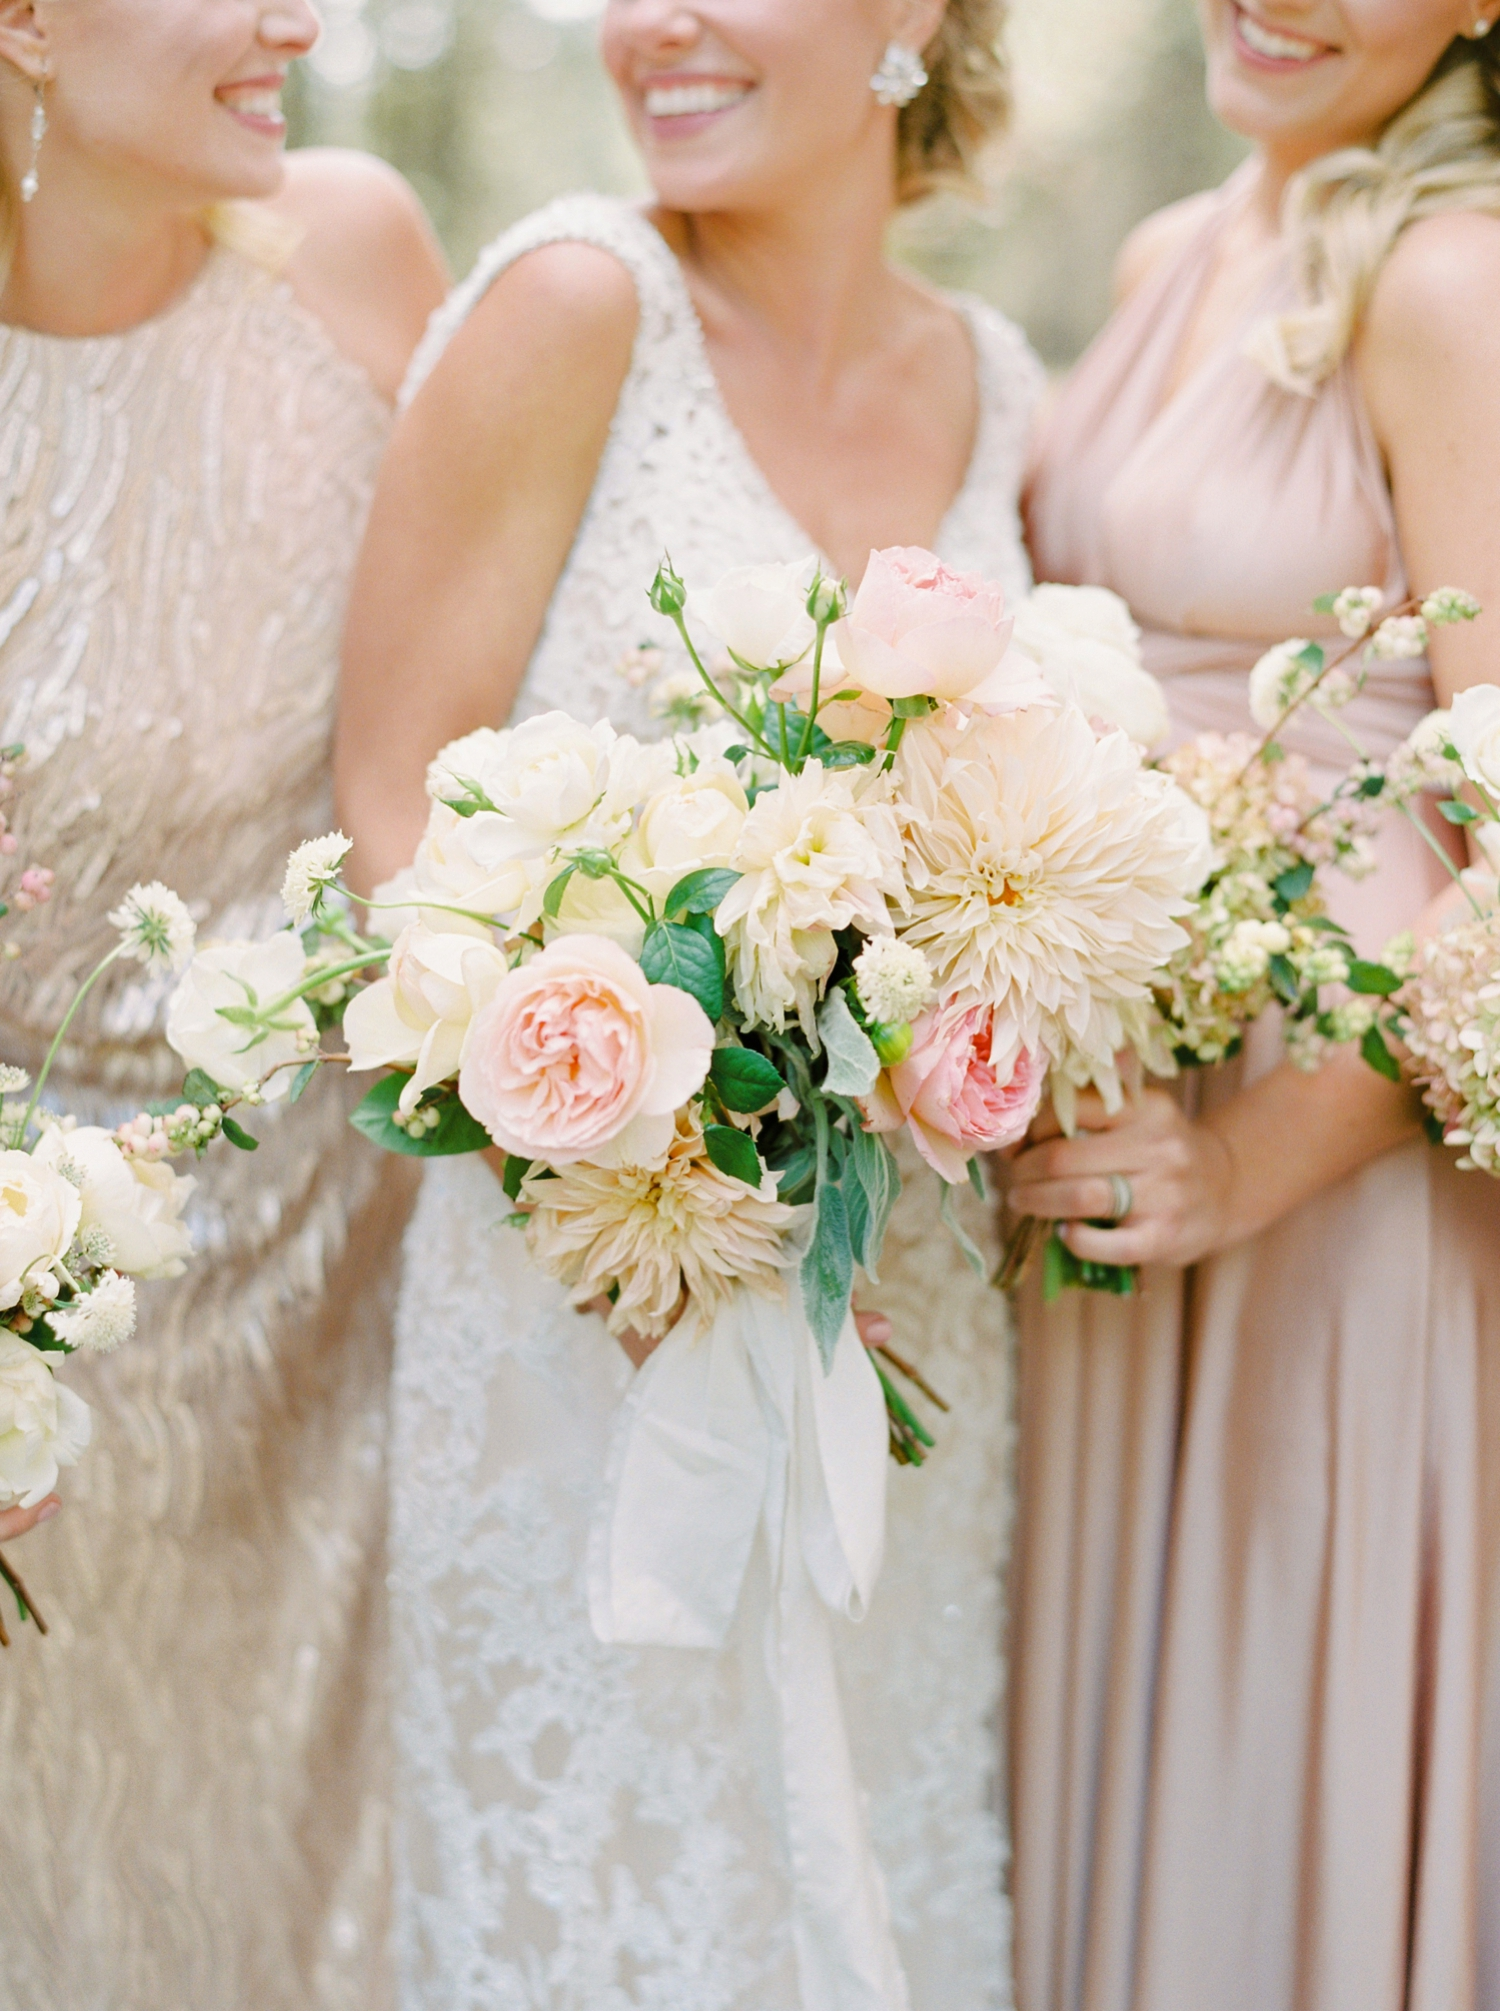 Calgary wedding photographers | oregon wedding photographers | fine art film | Justine Milton Photography | oregon wedding | bridesmaids portraits | pastel bridesmaids dresses | pastel bouquet